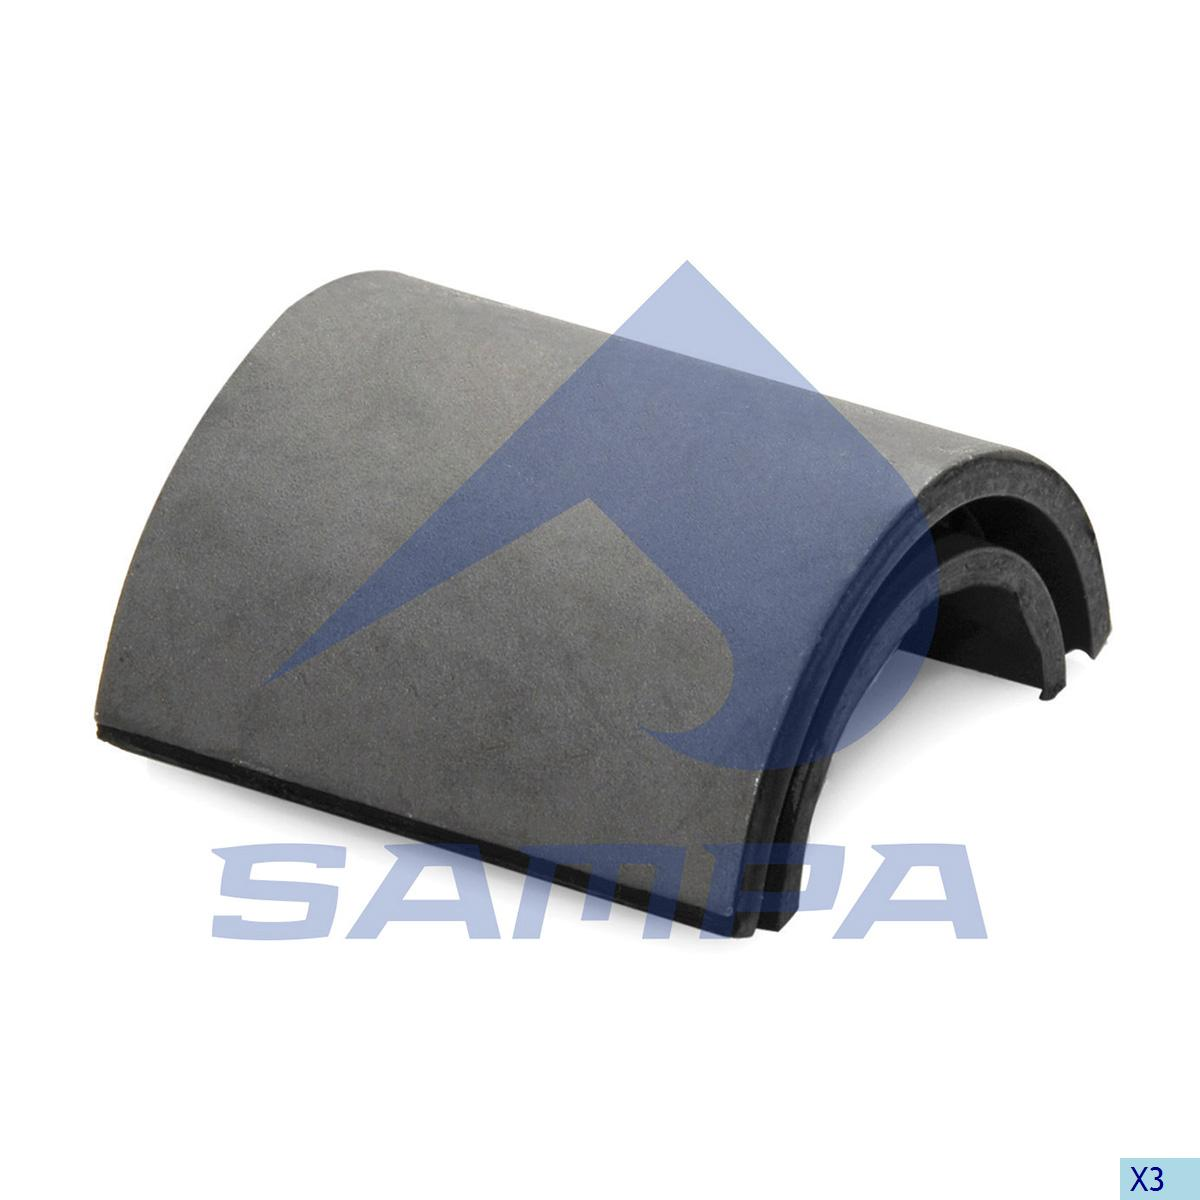 Half Bearing, Stabilizer Bar, Iveco, Suspension